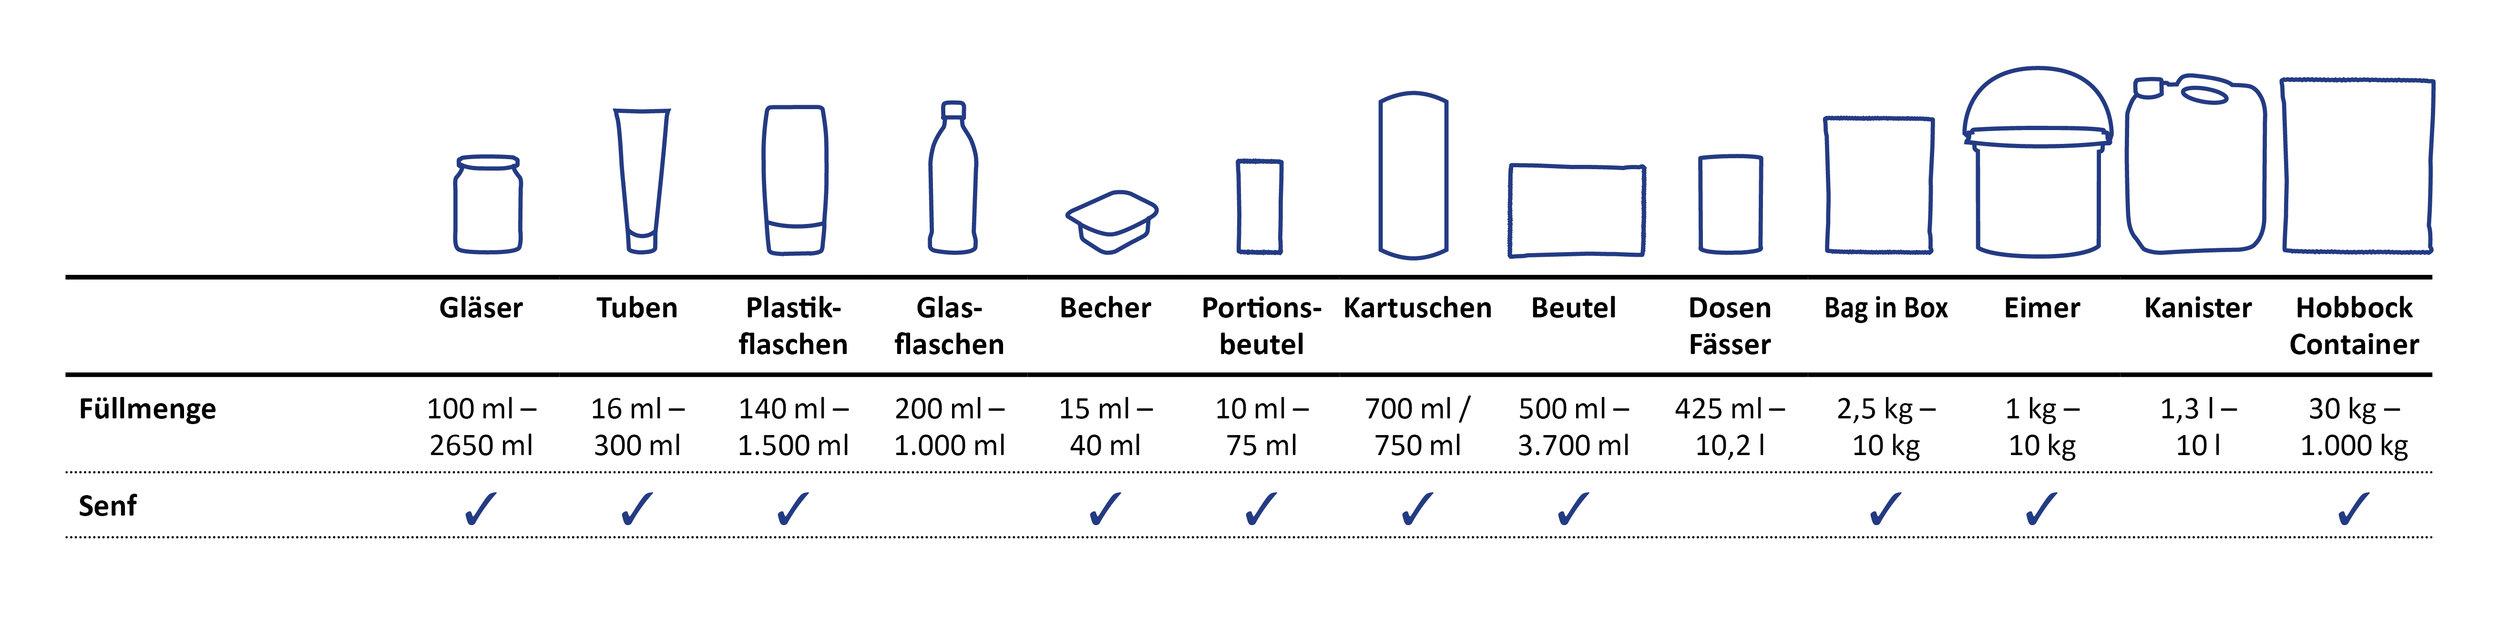 verpackungsuebersicht-sueko-senf.jpg